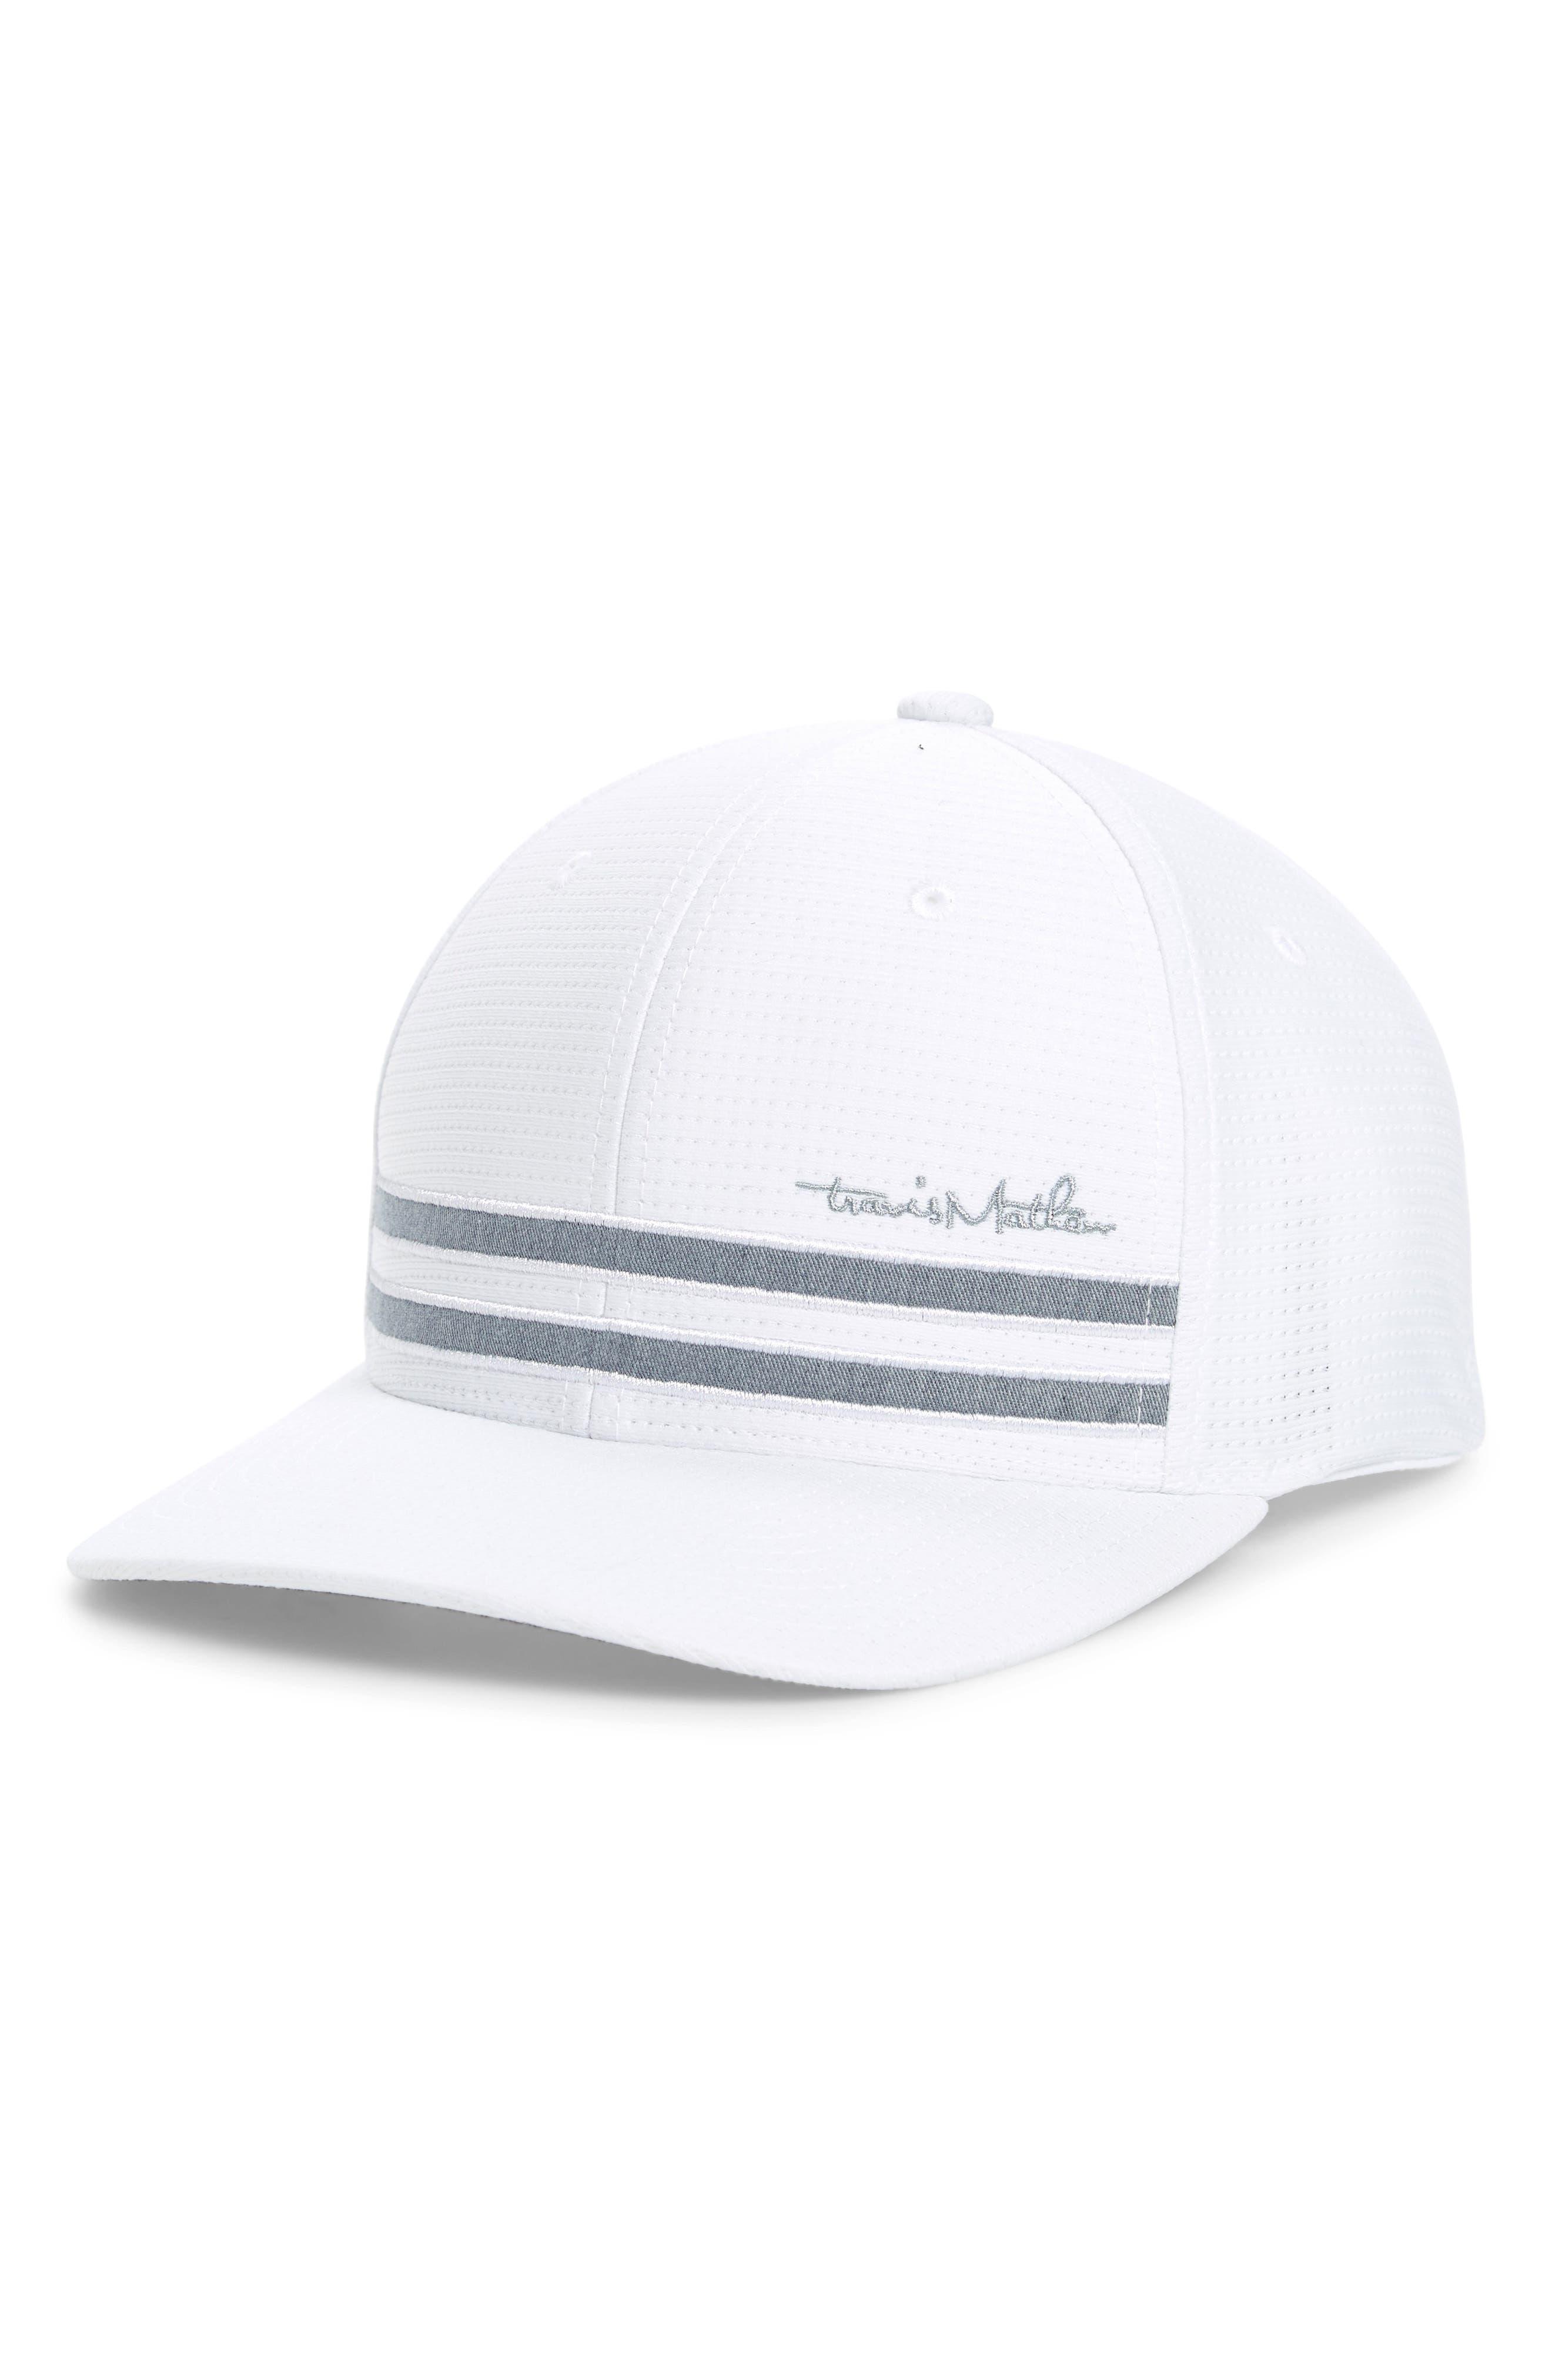 best service cf92b bdd21 ... cali patch hat white fe9ab 01553  discount code for travis mathew hout  golfer cap main color white c8630 26875